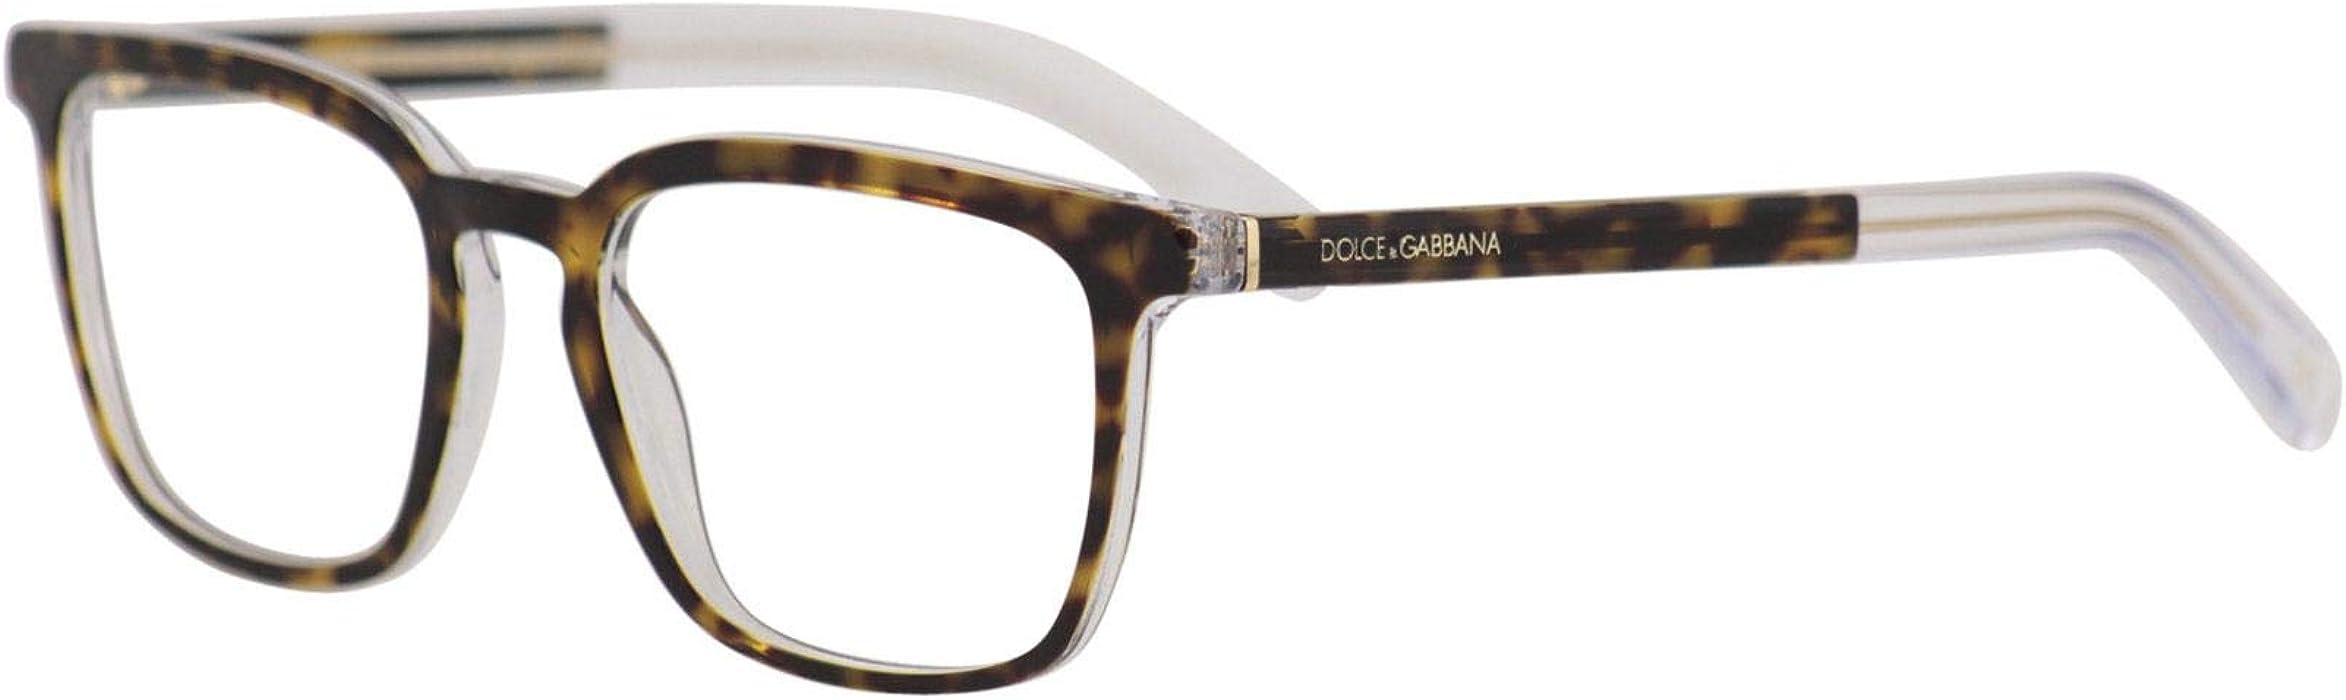 957d6c7499e5 Dolce   Gabbana ANGEL DG 3307 HAVANA CRYSTAL 53 19 145 men eyewear frame